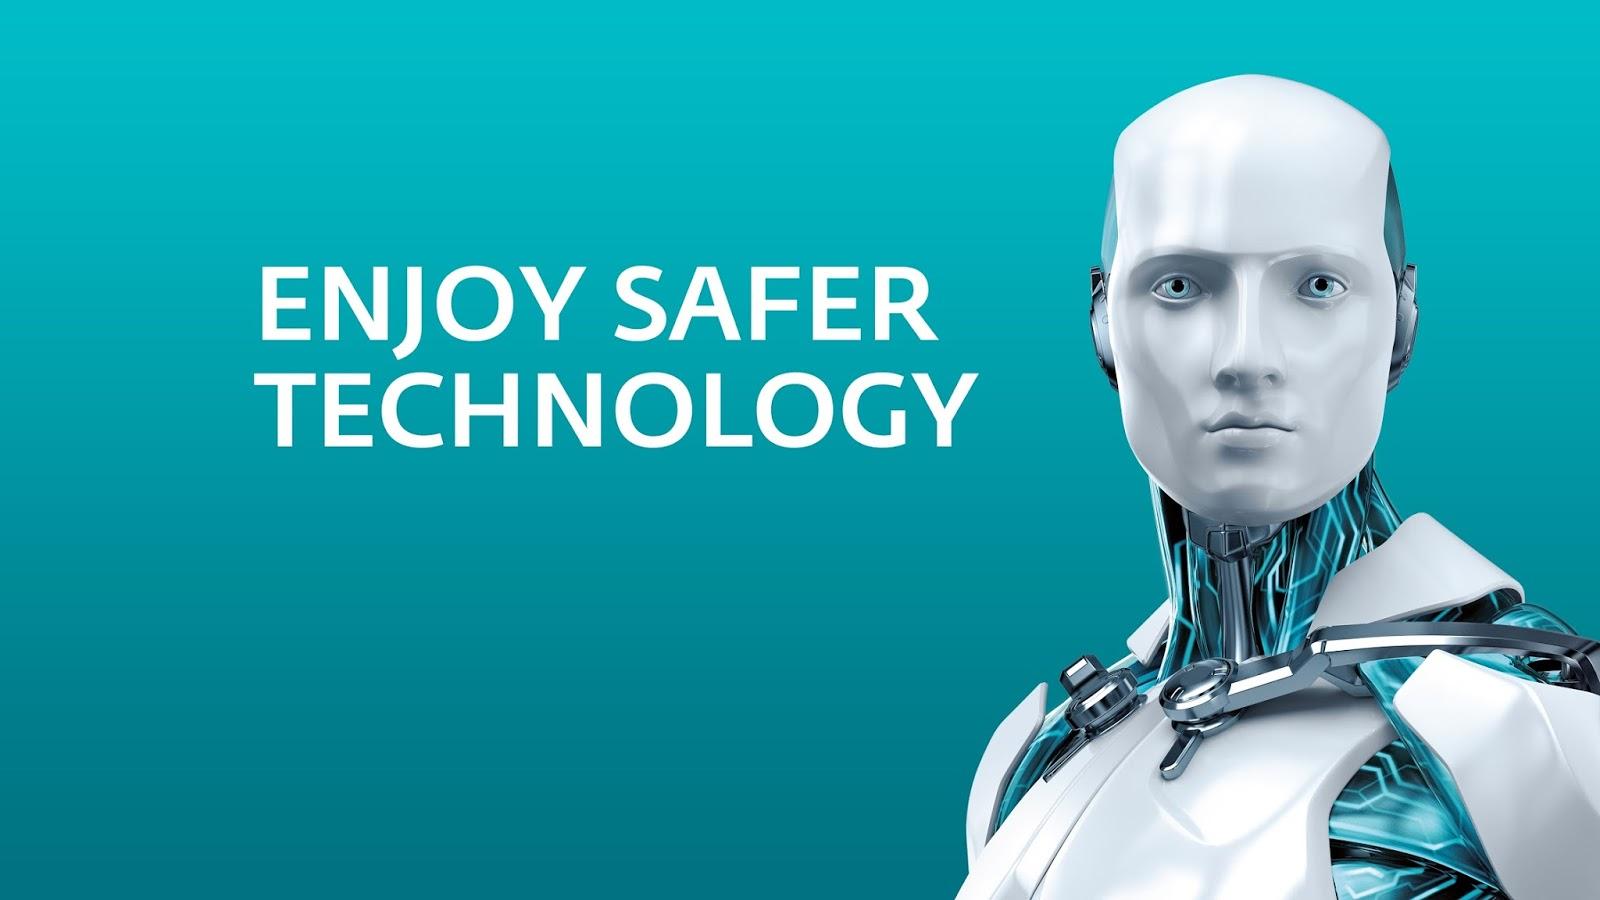 Free key eset smart security 9, eset nod32 antivirus 9 - update daily